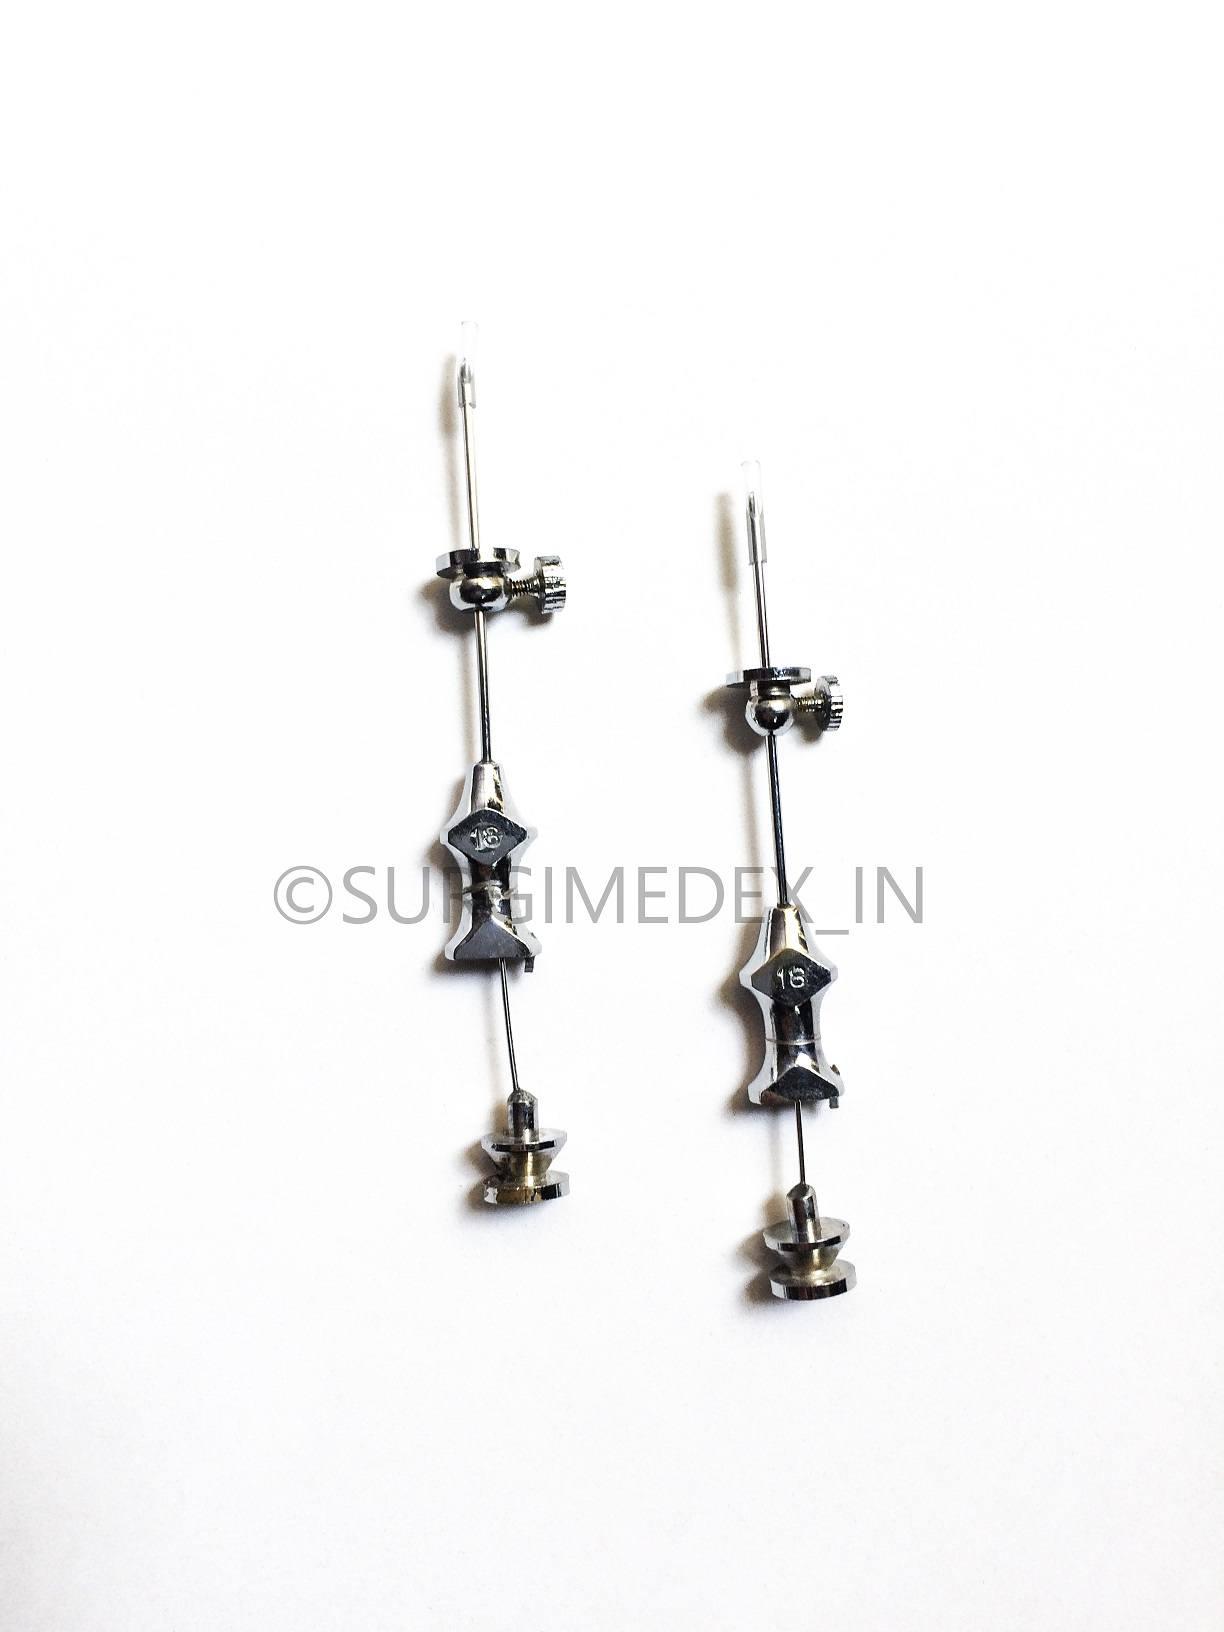 Bone Marrow Aspiration Needle (Metal, Salah type) – 14, 16, 18G, 5 Cm long